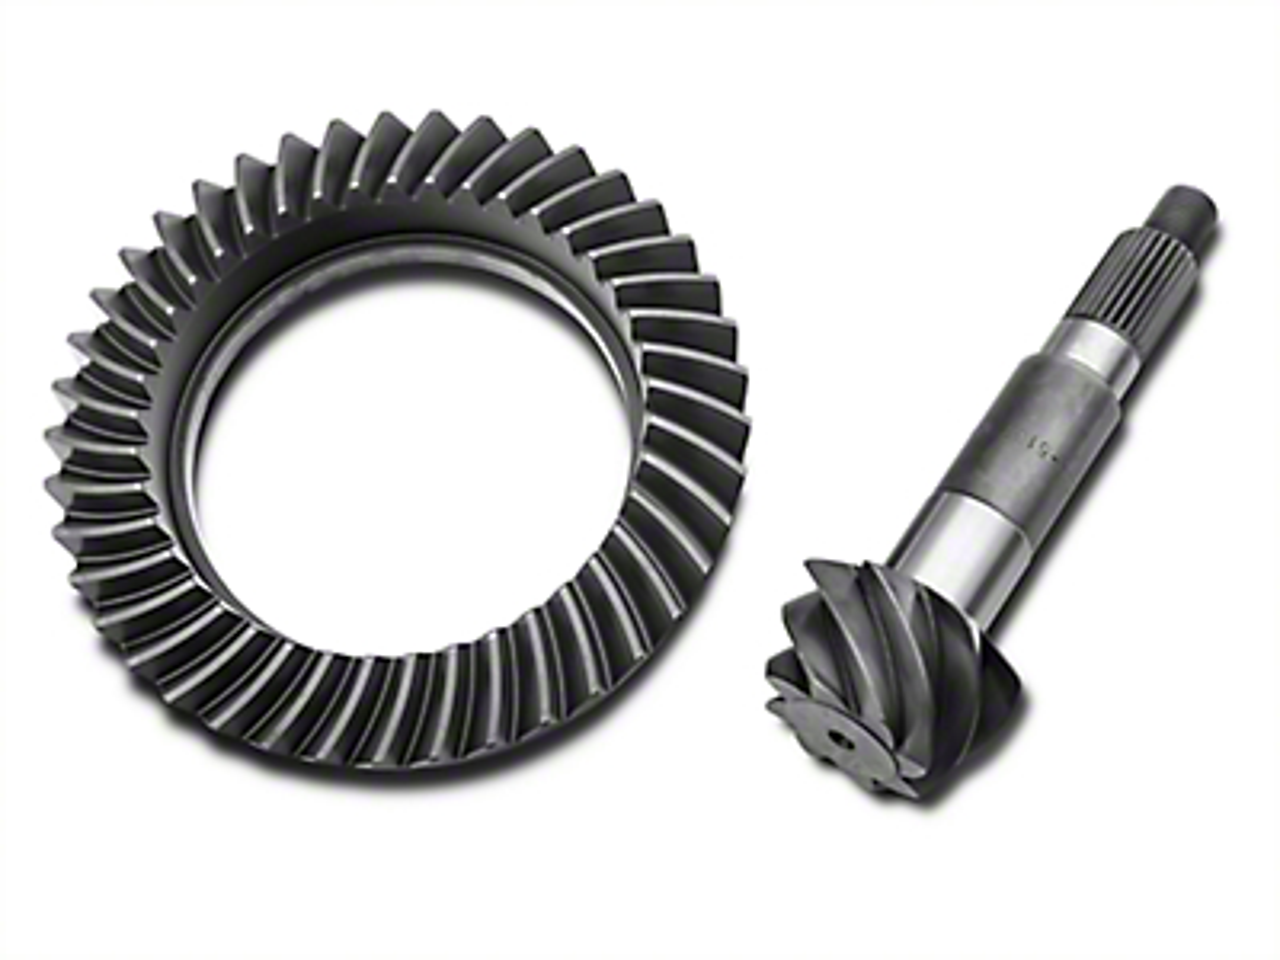 Yukon Gear Dana 44 Rear Ring Gear and Pinion Kit - 5.13 Gears (03-06 Wrangler TJ Rubicon)